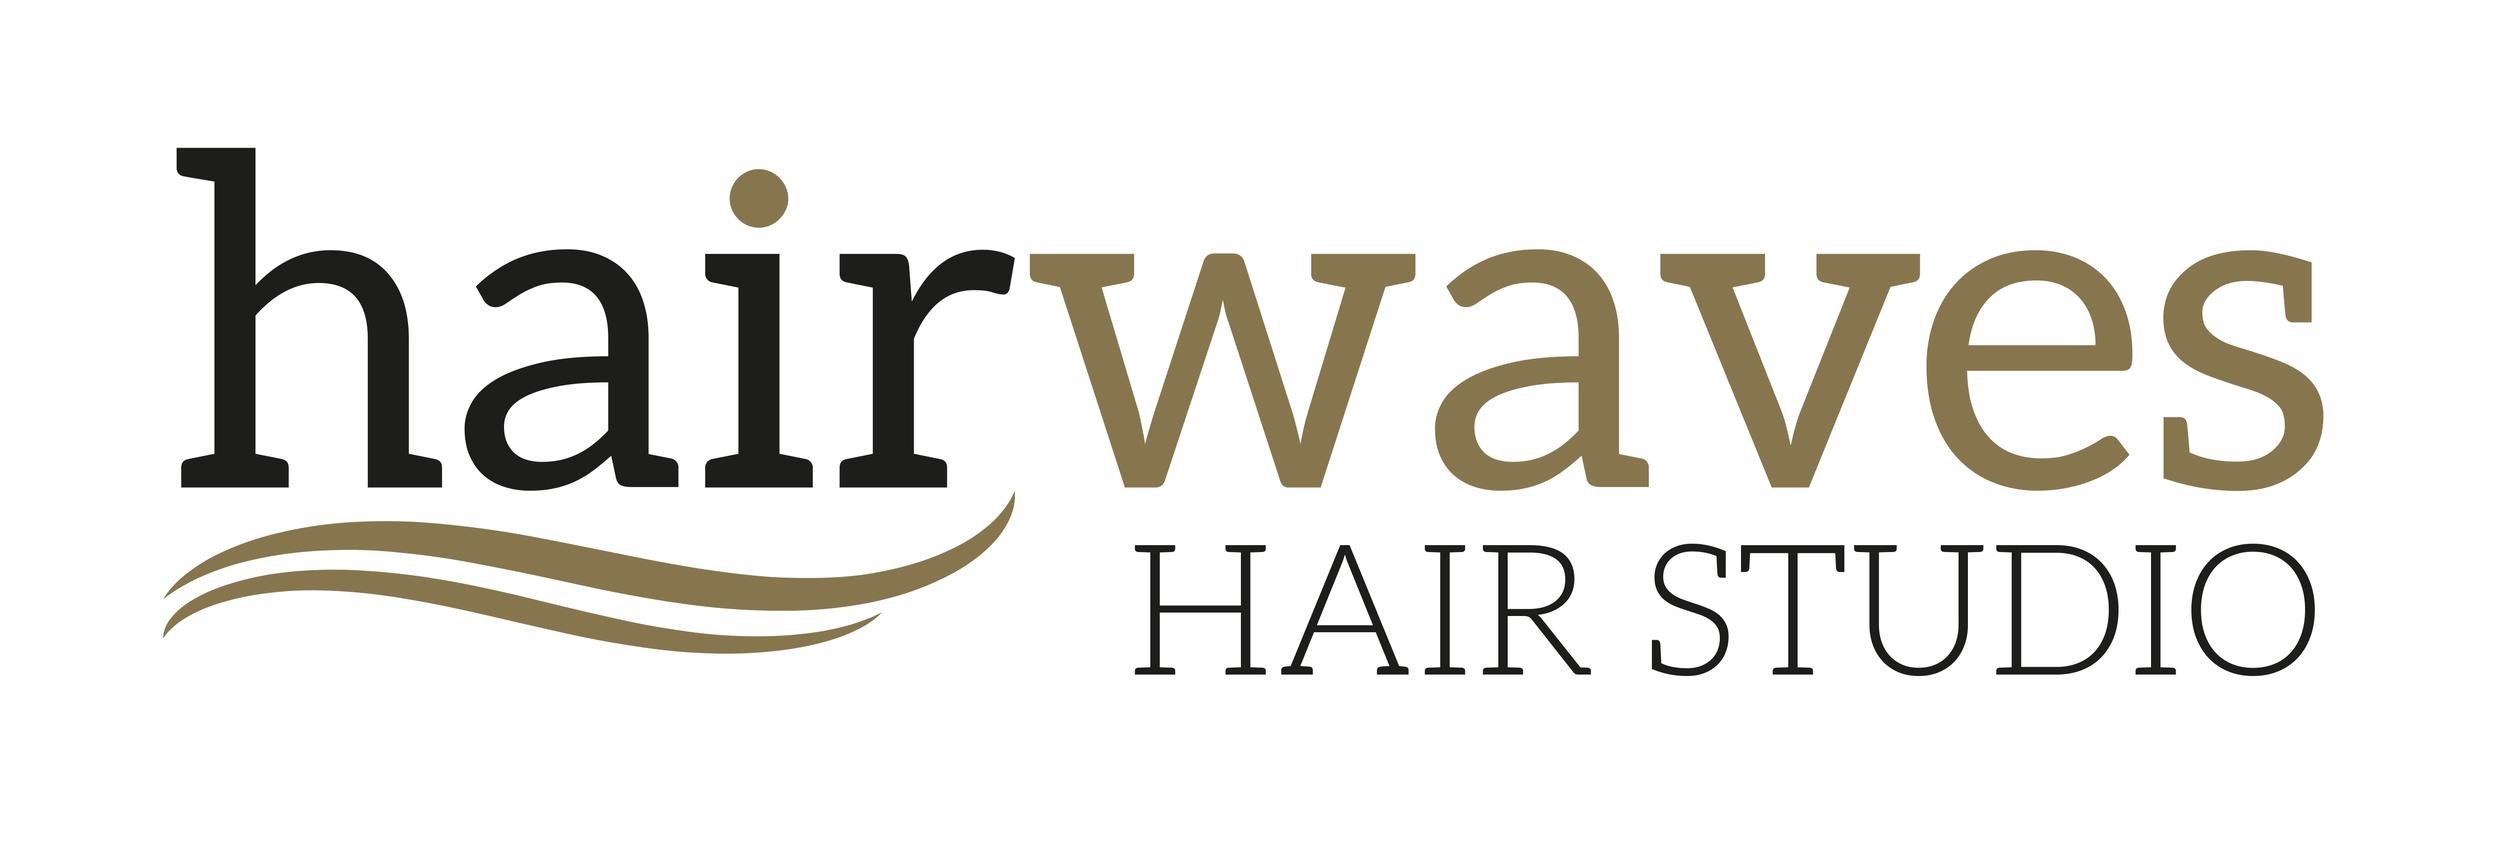 hairwaves logo Final.jpg